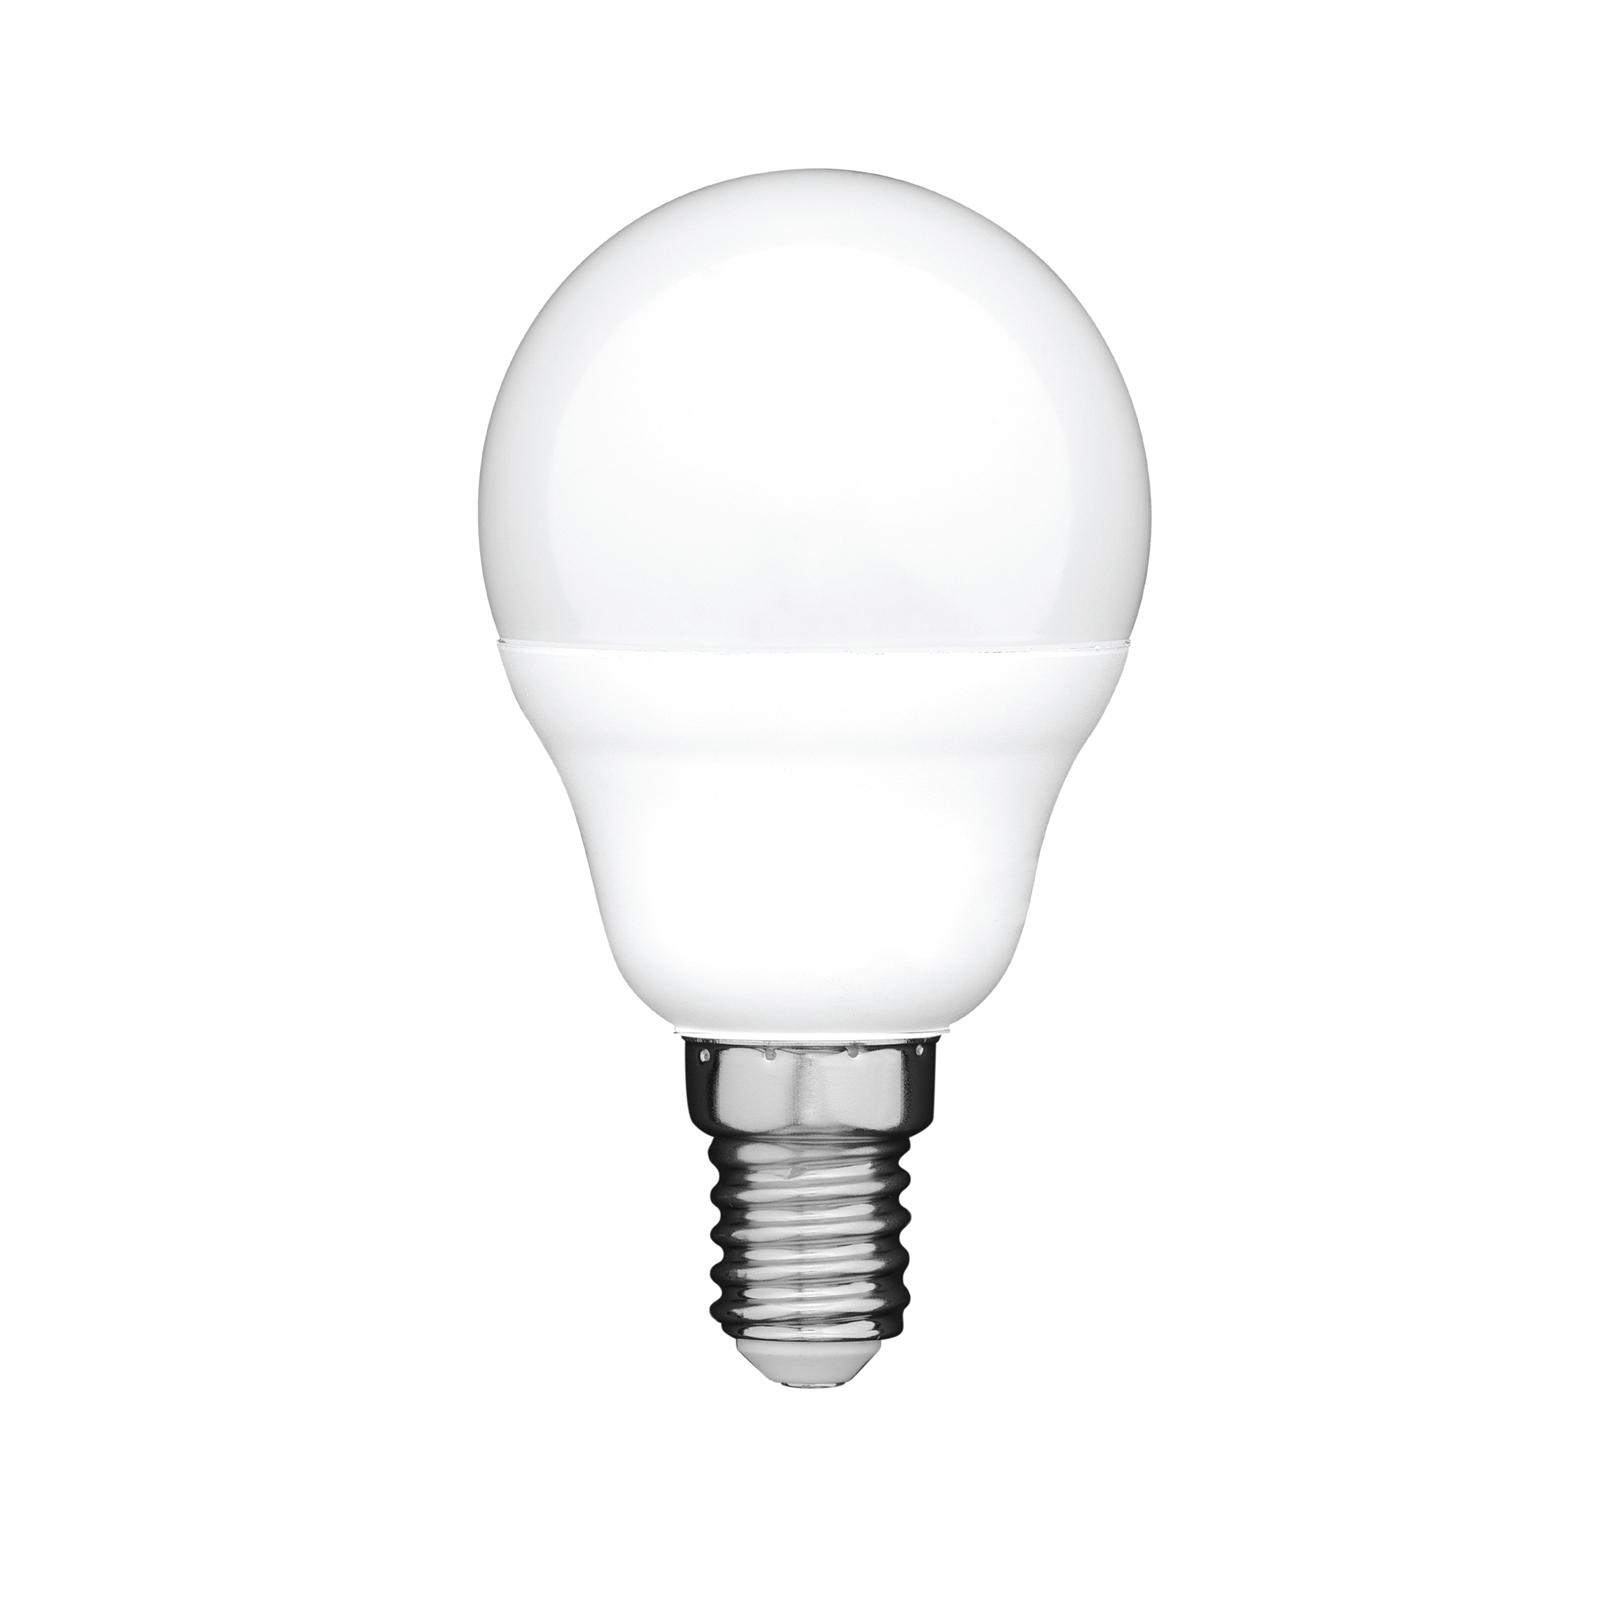 Arlec Grid Connect Smart 4W 380lm Warm White Fancy Round SES E14 Globe